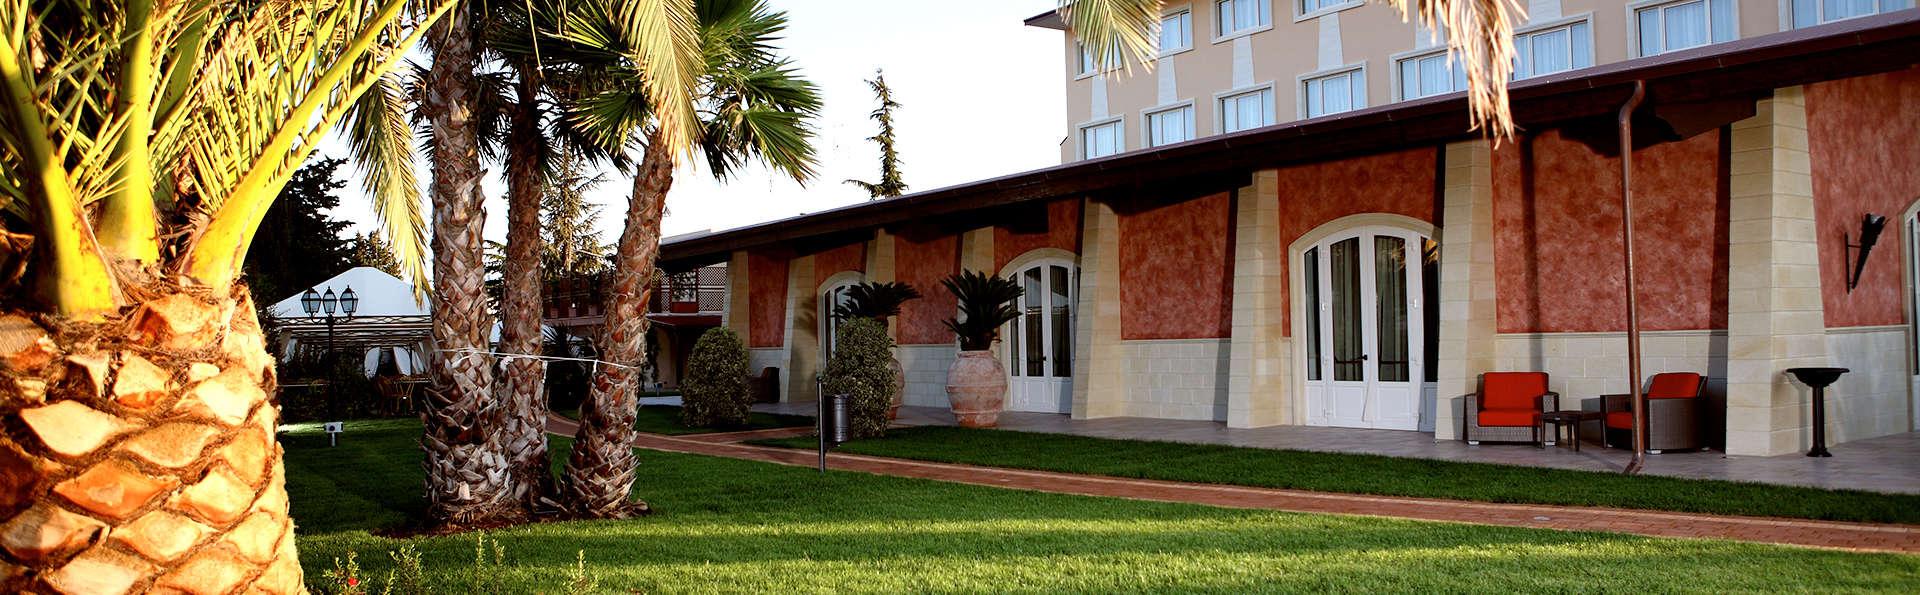 Semiramide Palace Hotel  - Edit_front2.jpg